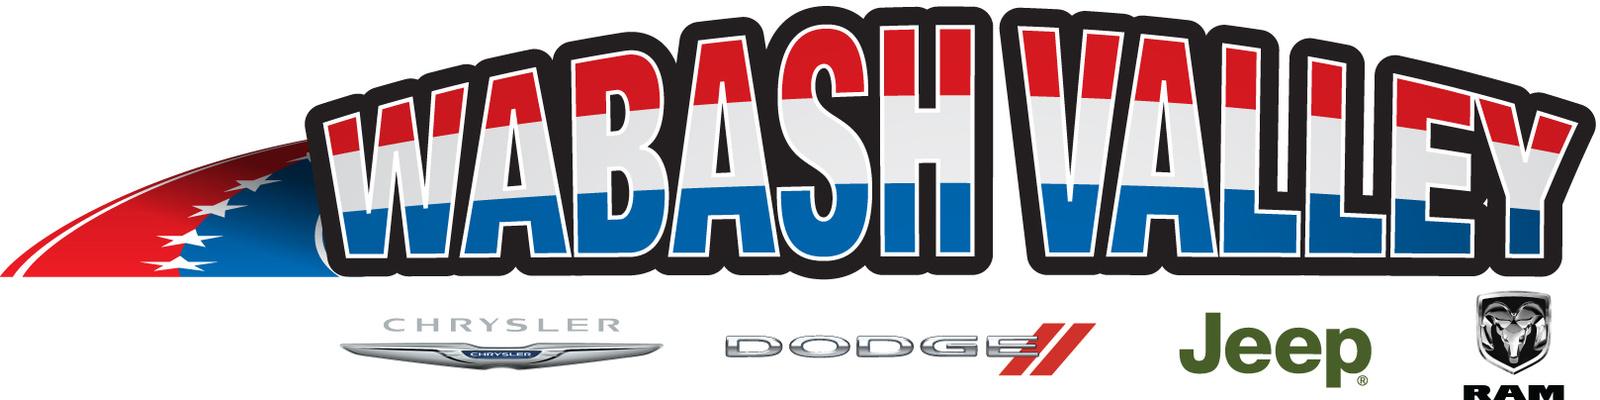 Wabash Valley Chrysler LLC - Wabash, IN: Read Consumer reviews ...